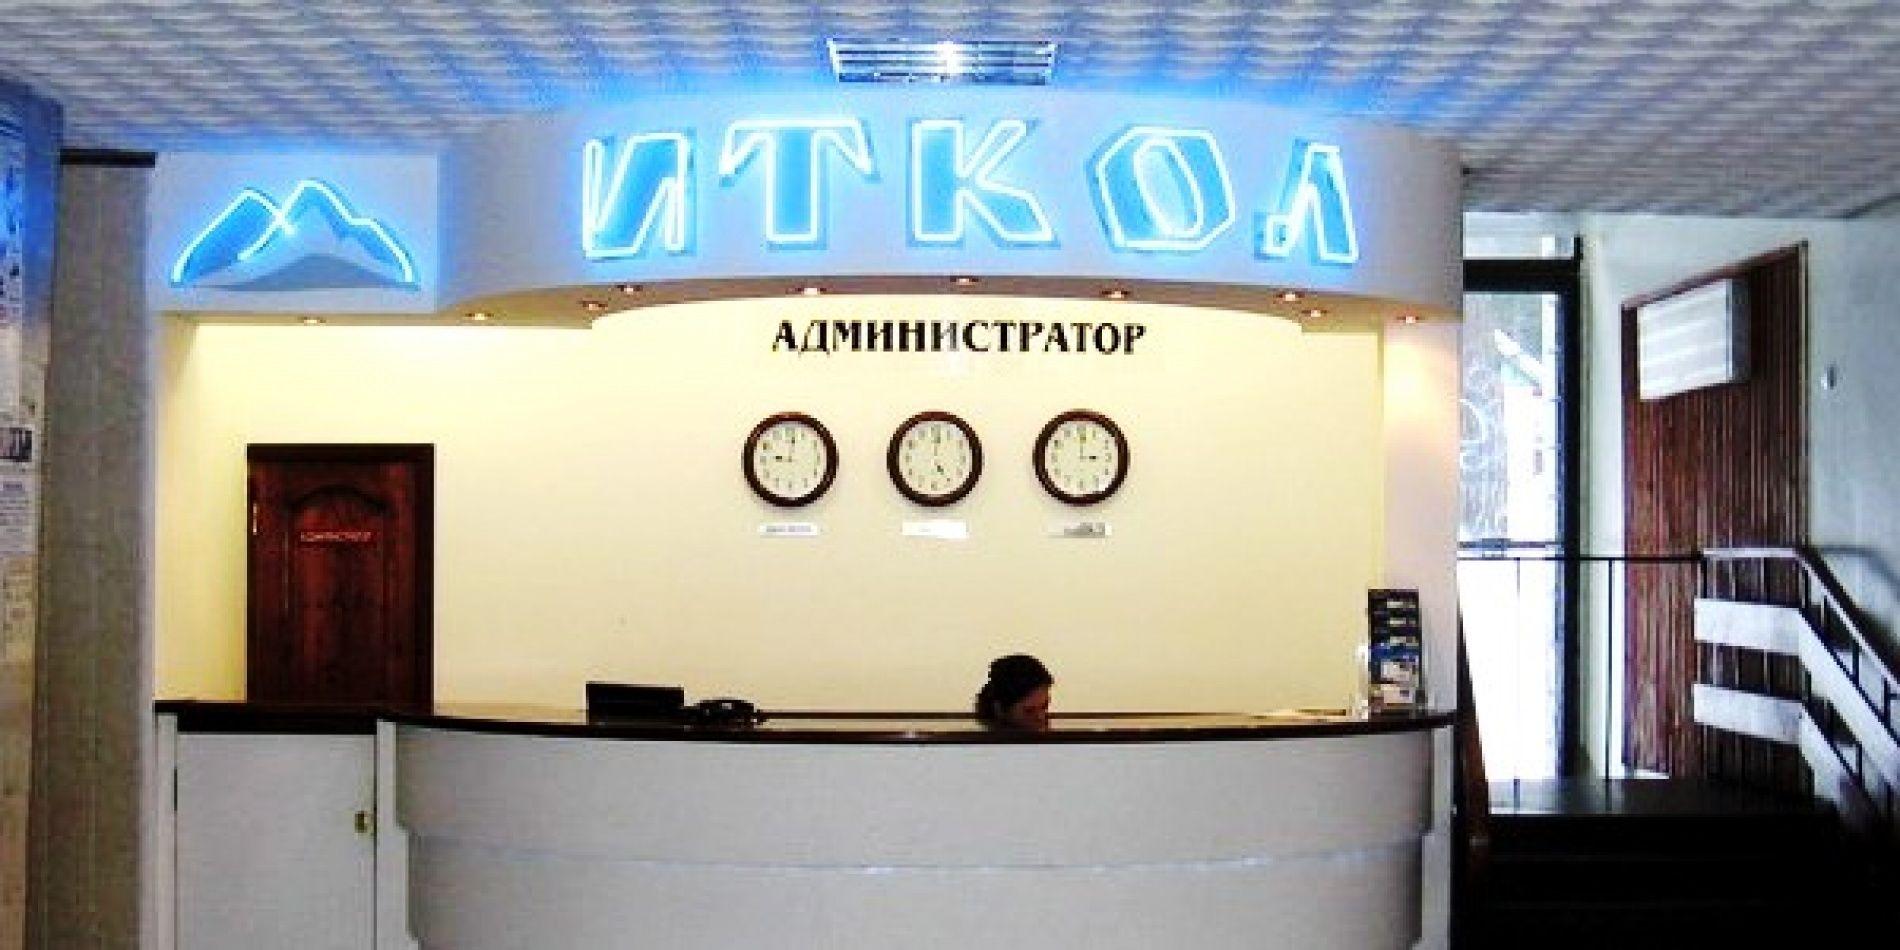 "Пансионат ""Иткол"" Кабардино-Балкарская Республика, фото 2"